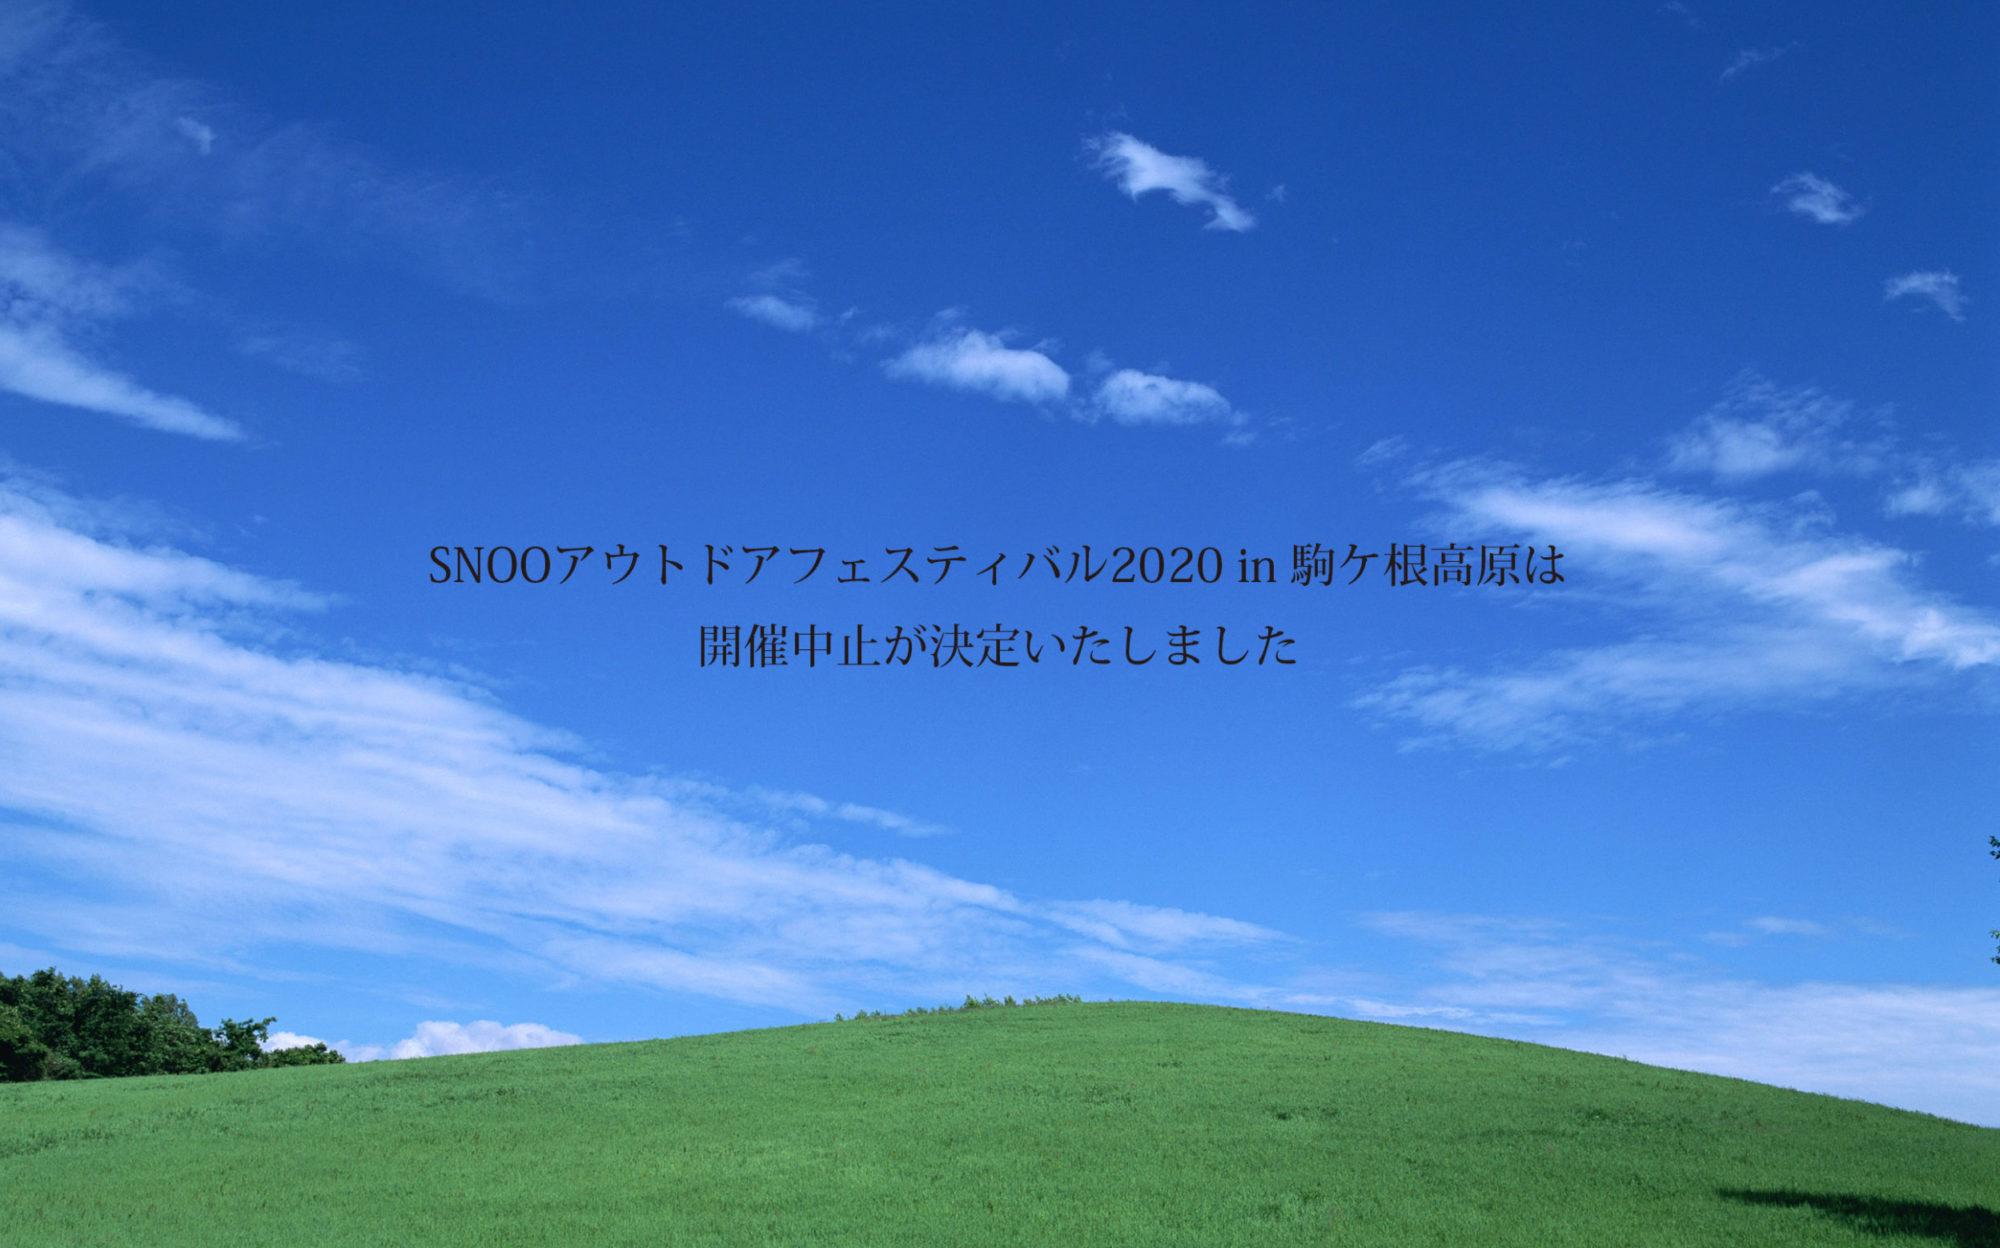 SNOOアウトドアフェスティバル公式サイト